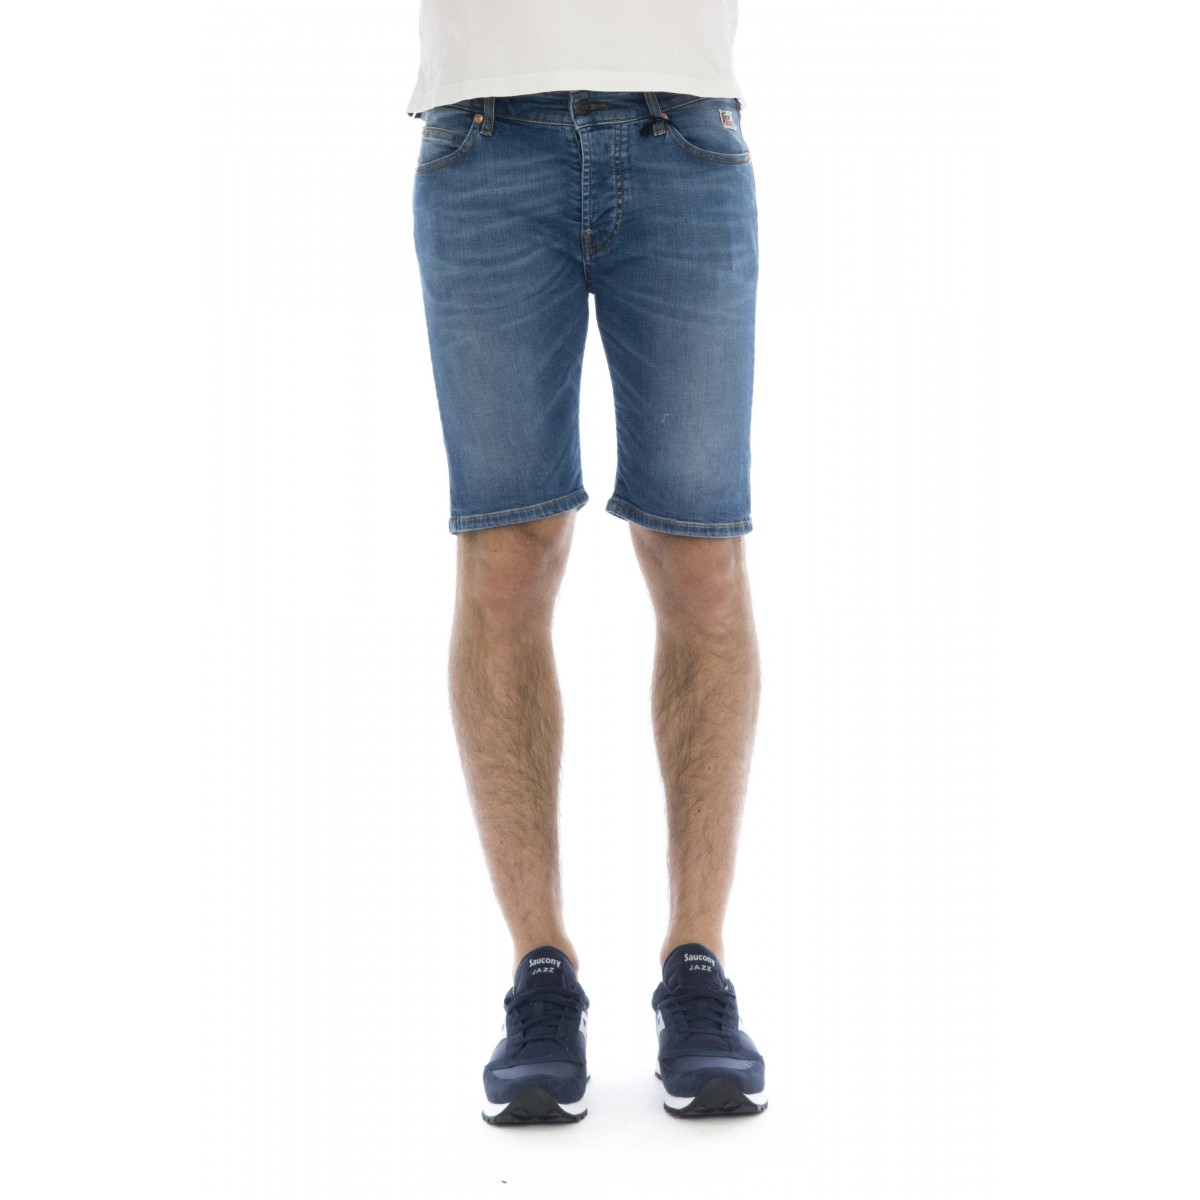 Bermuda - 529 nocaine bermuda jeans